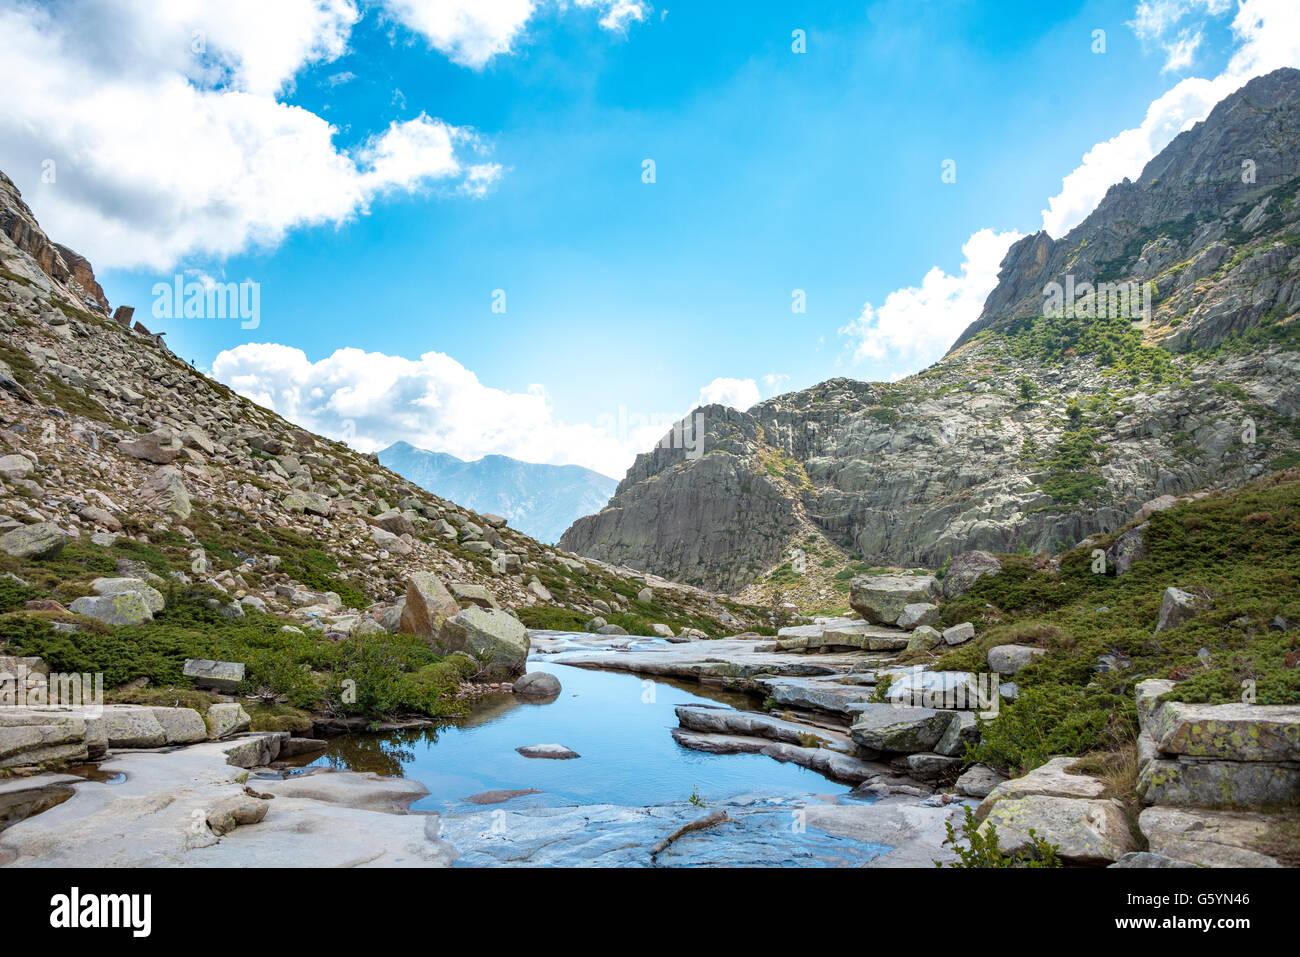 Schwimmbad in die Berge, Fluss Golo, Natur Naturpark von Korsika, Parc Naturel Régional de Corse, Korsika, Stockbild